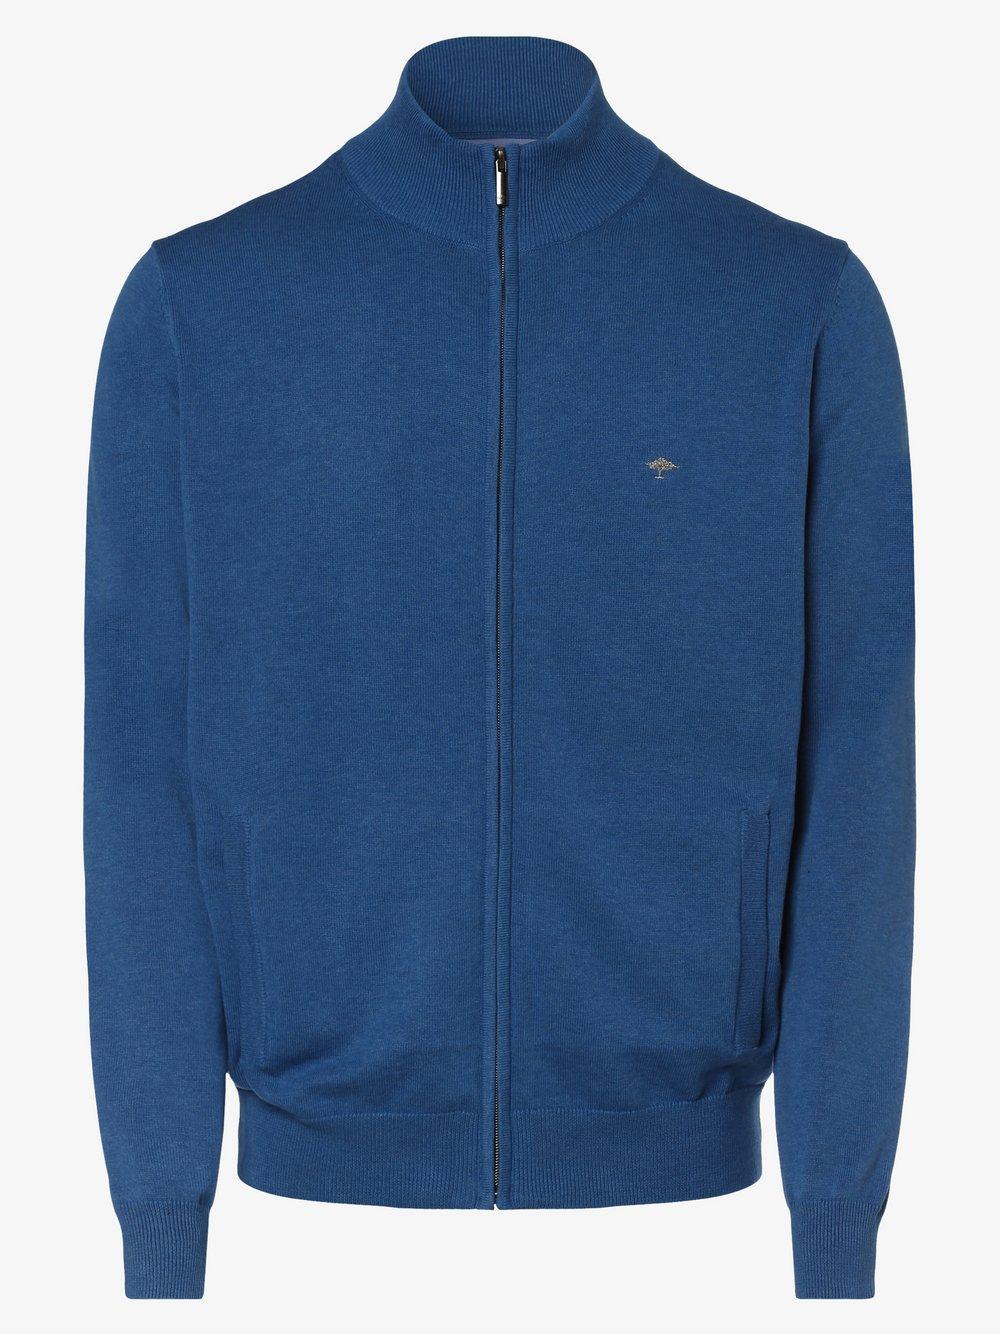 Fynch-Hatton – Kardigan męski, niebieski Van Graaf 454964-0001